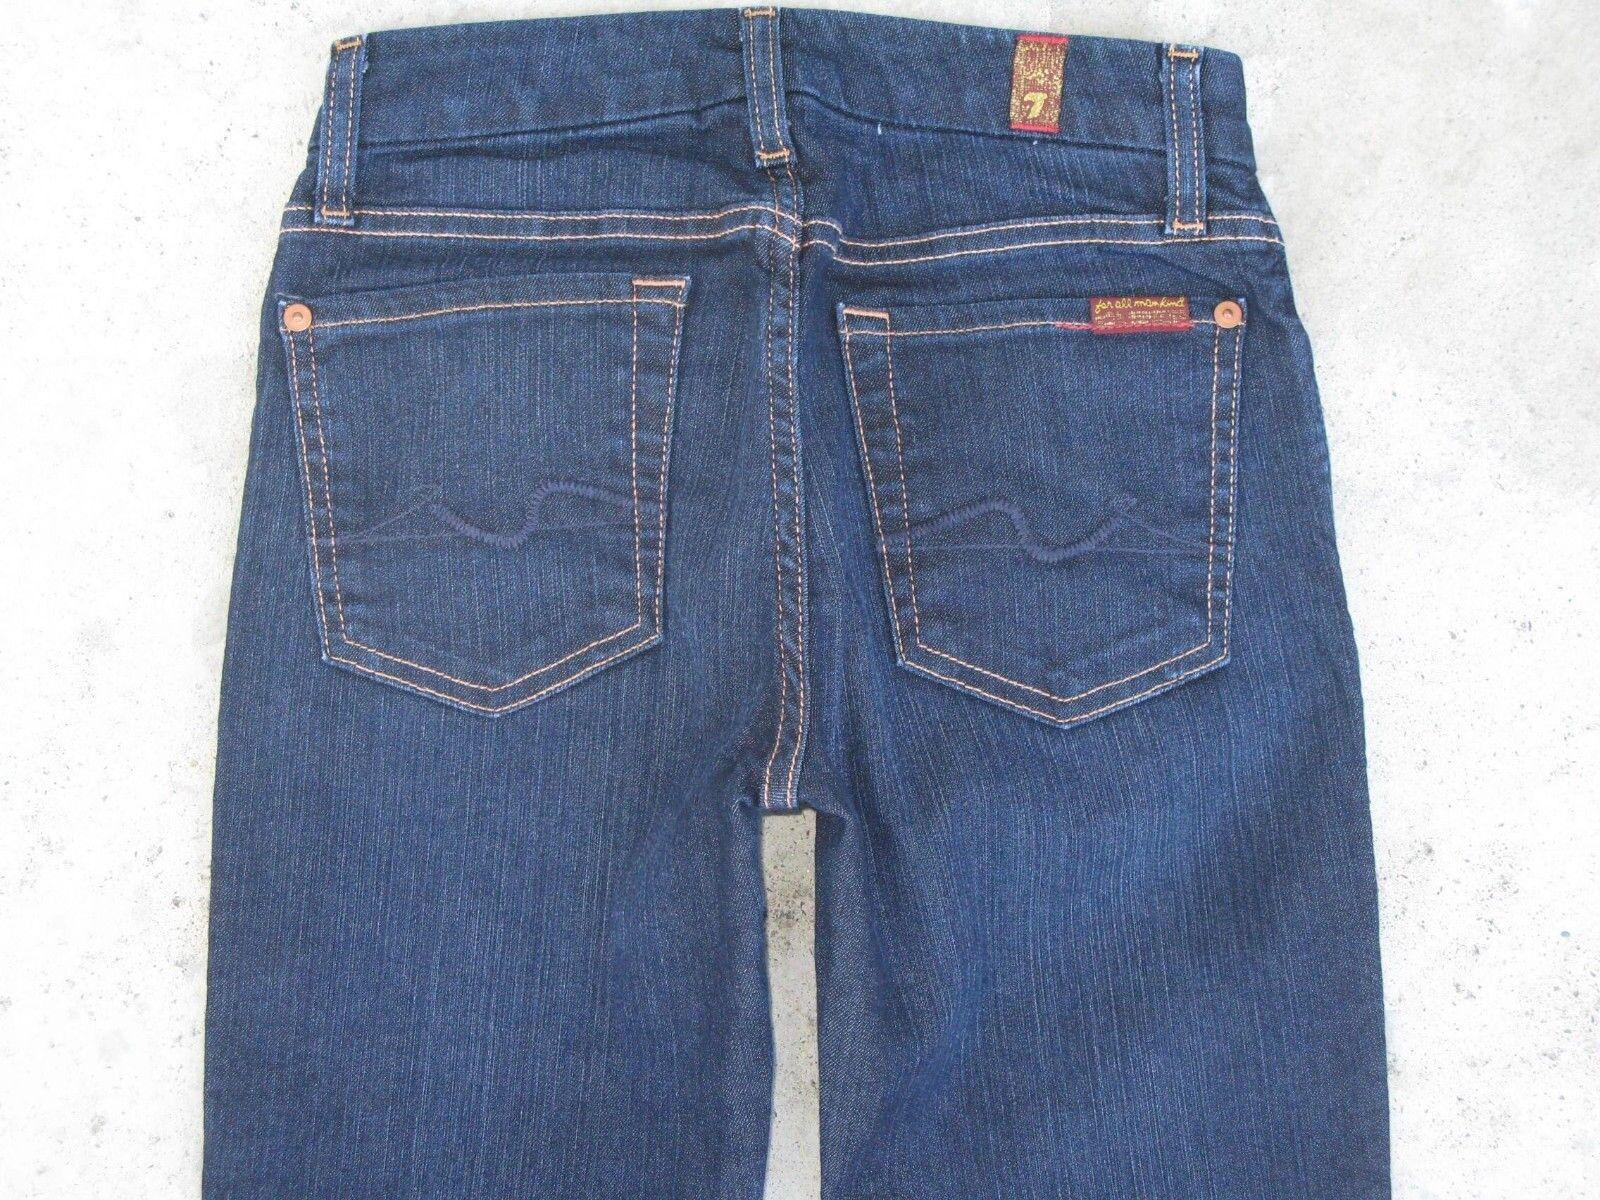 7 for all Mankind Lexie Kimmie Bootcut Jeans Sz 24 Mid Rise Dark bluee